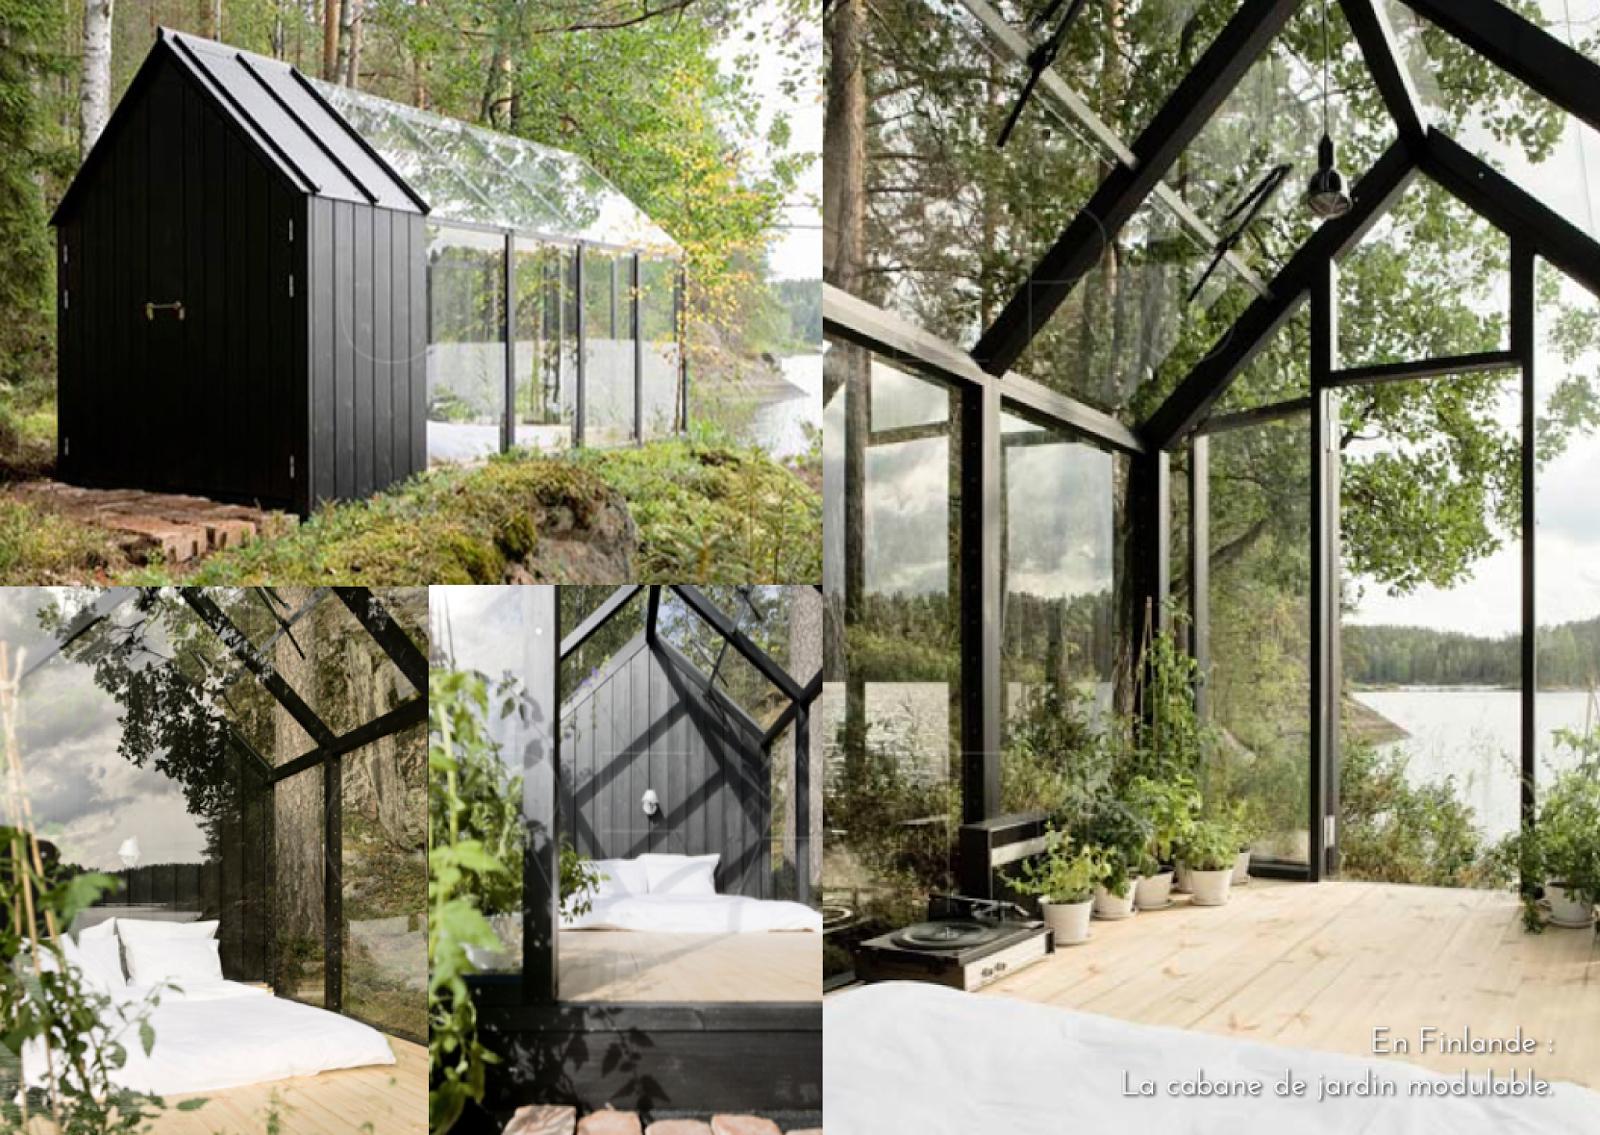 En Finlande : La Cabane De Jardin Modulable.   Cabane Jardin ... intérieur Abri De Jardin Finlandais